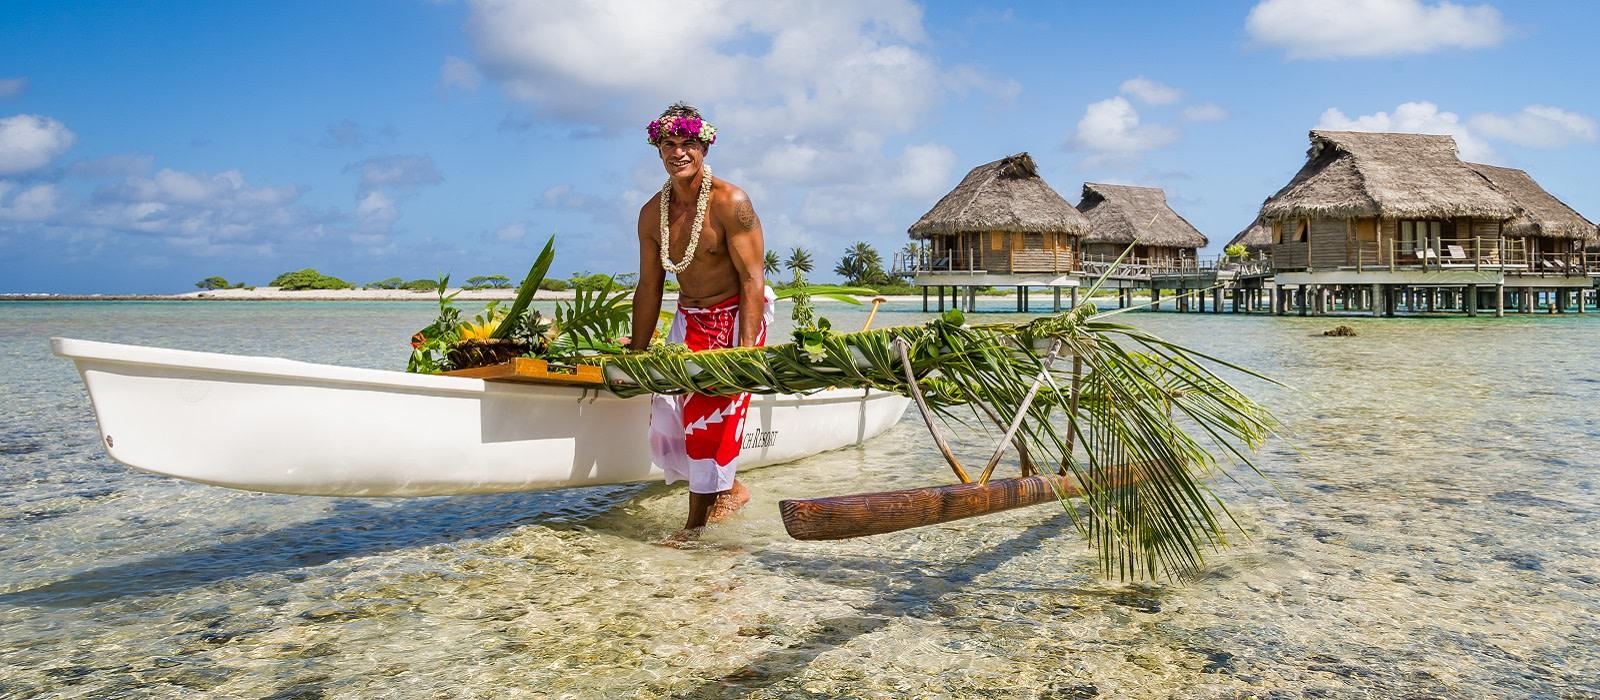 French Polynesia Vacation - Local Man